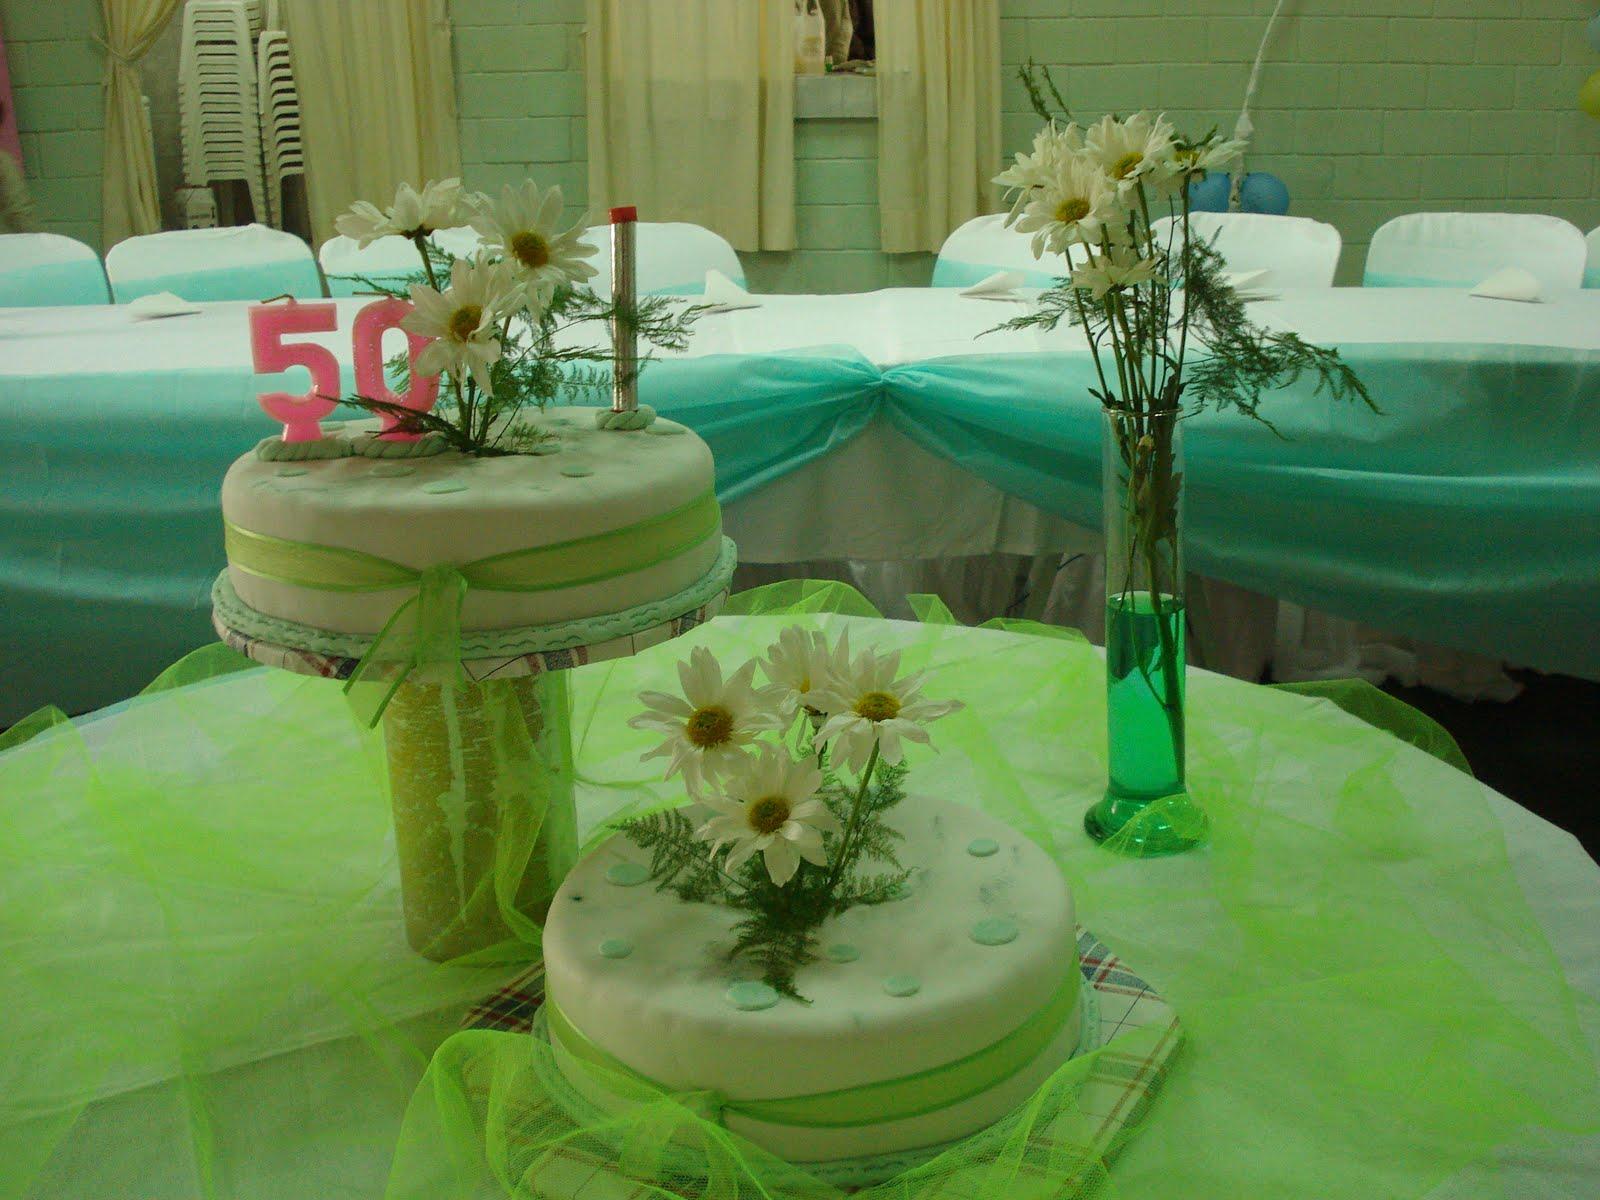 Decoraciones de eventos torta de 50 a os - Decoracion 50 cumpleanos ...